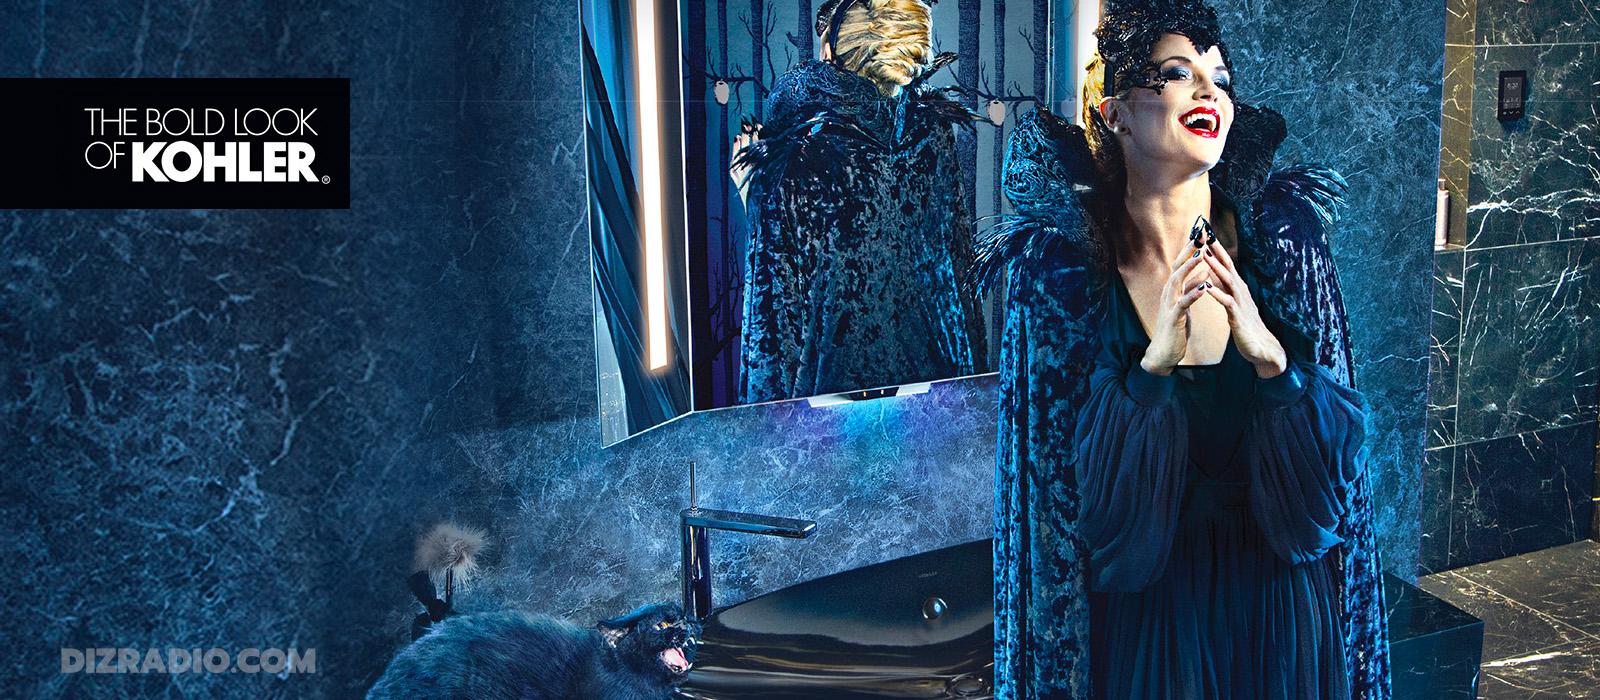 "Kohler Co. And Disney Team Up On ""Maleficent: Mistress Of Evil"" Voice Lighted Mirror!"